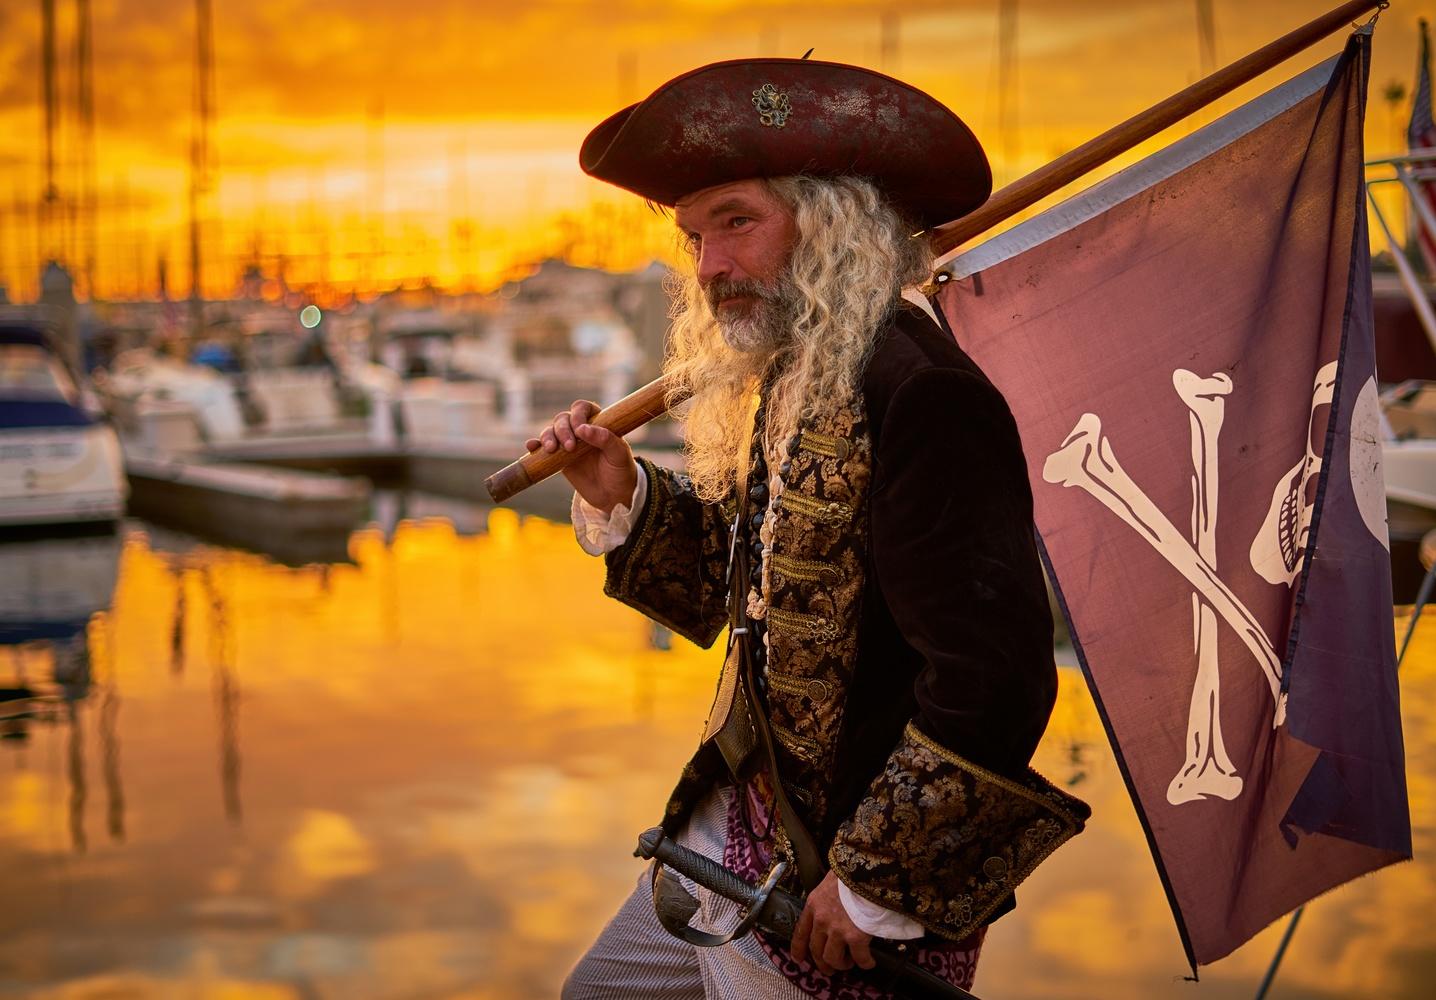 Pirate sunsets by Josh Tomsha